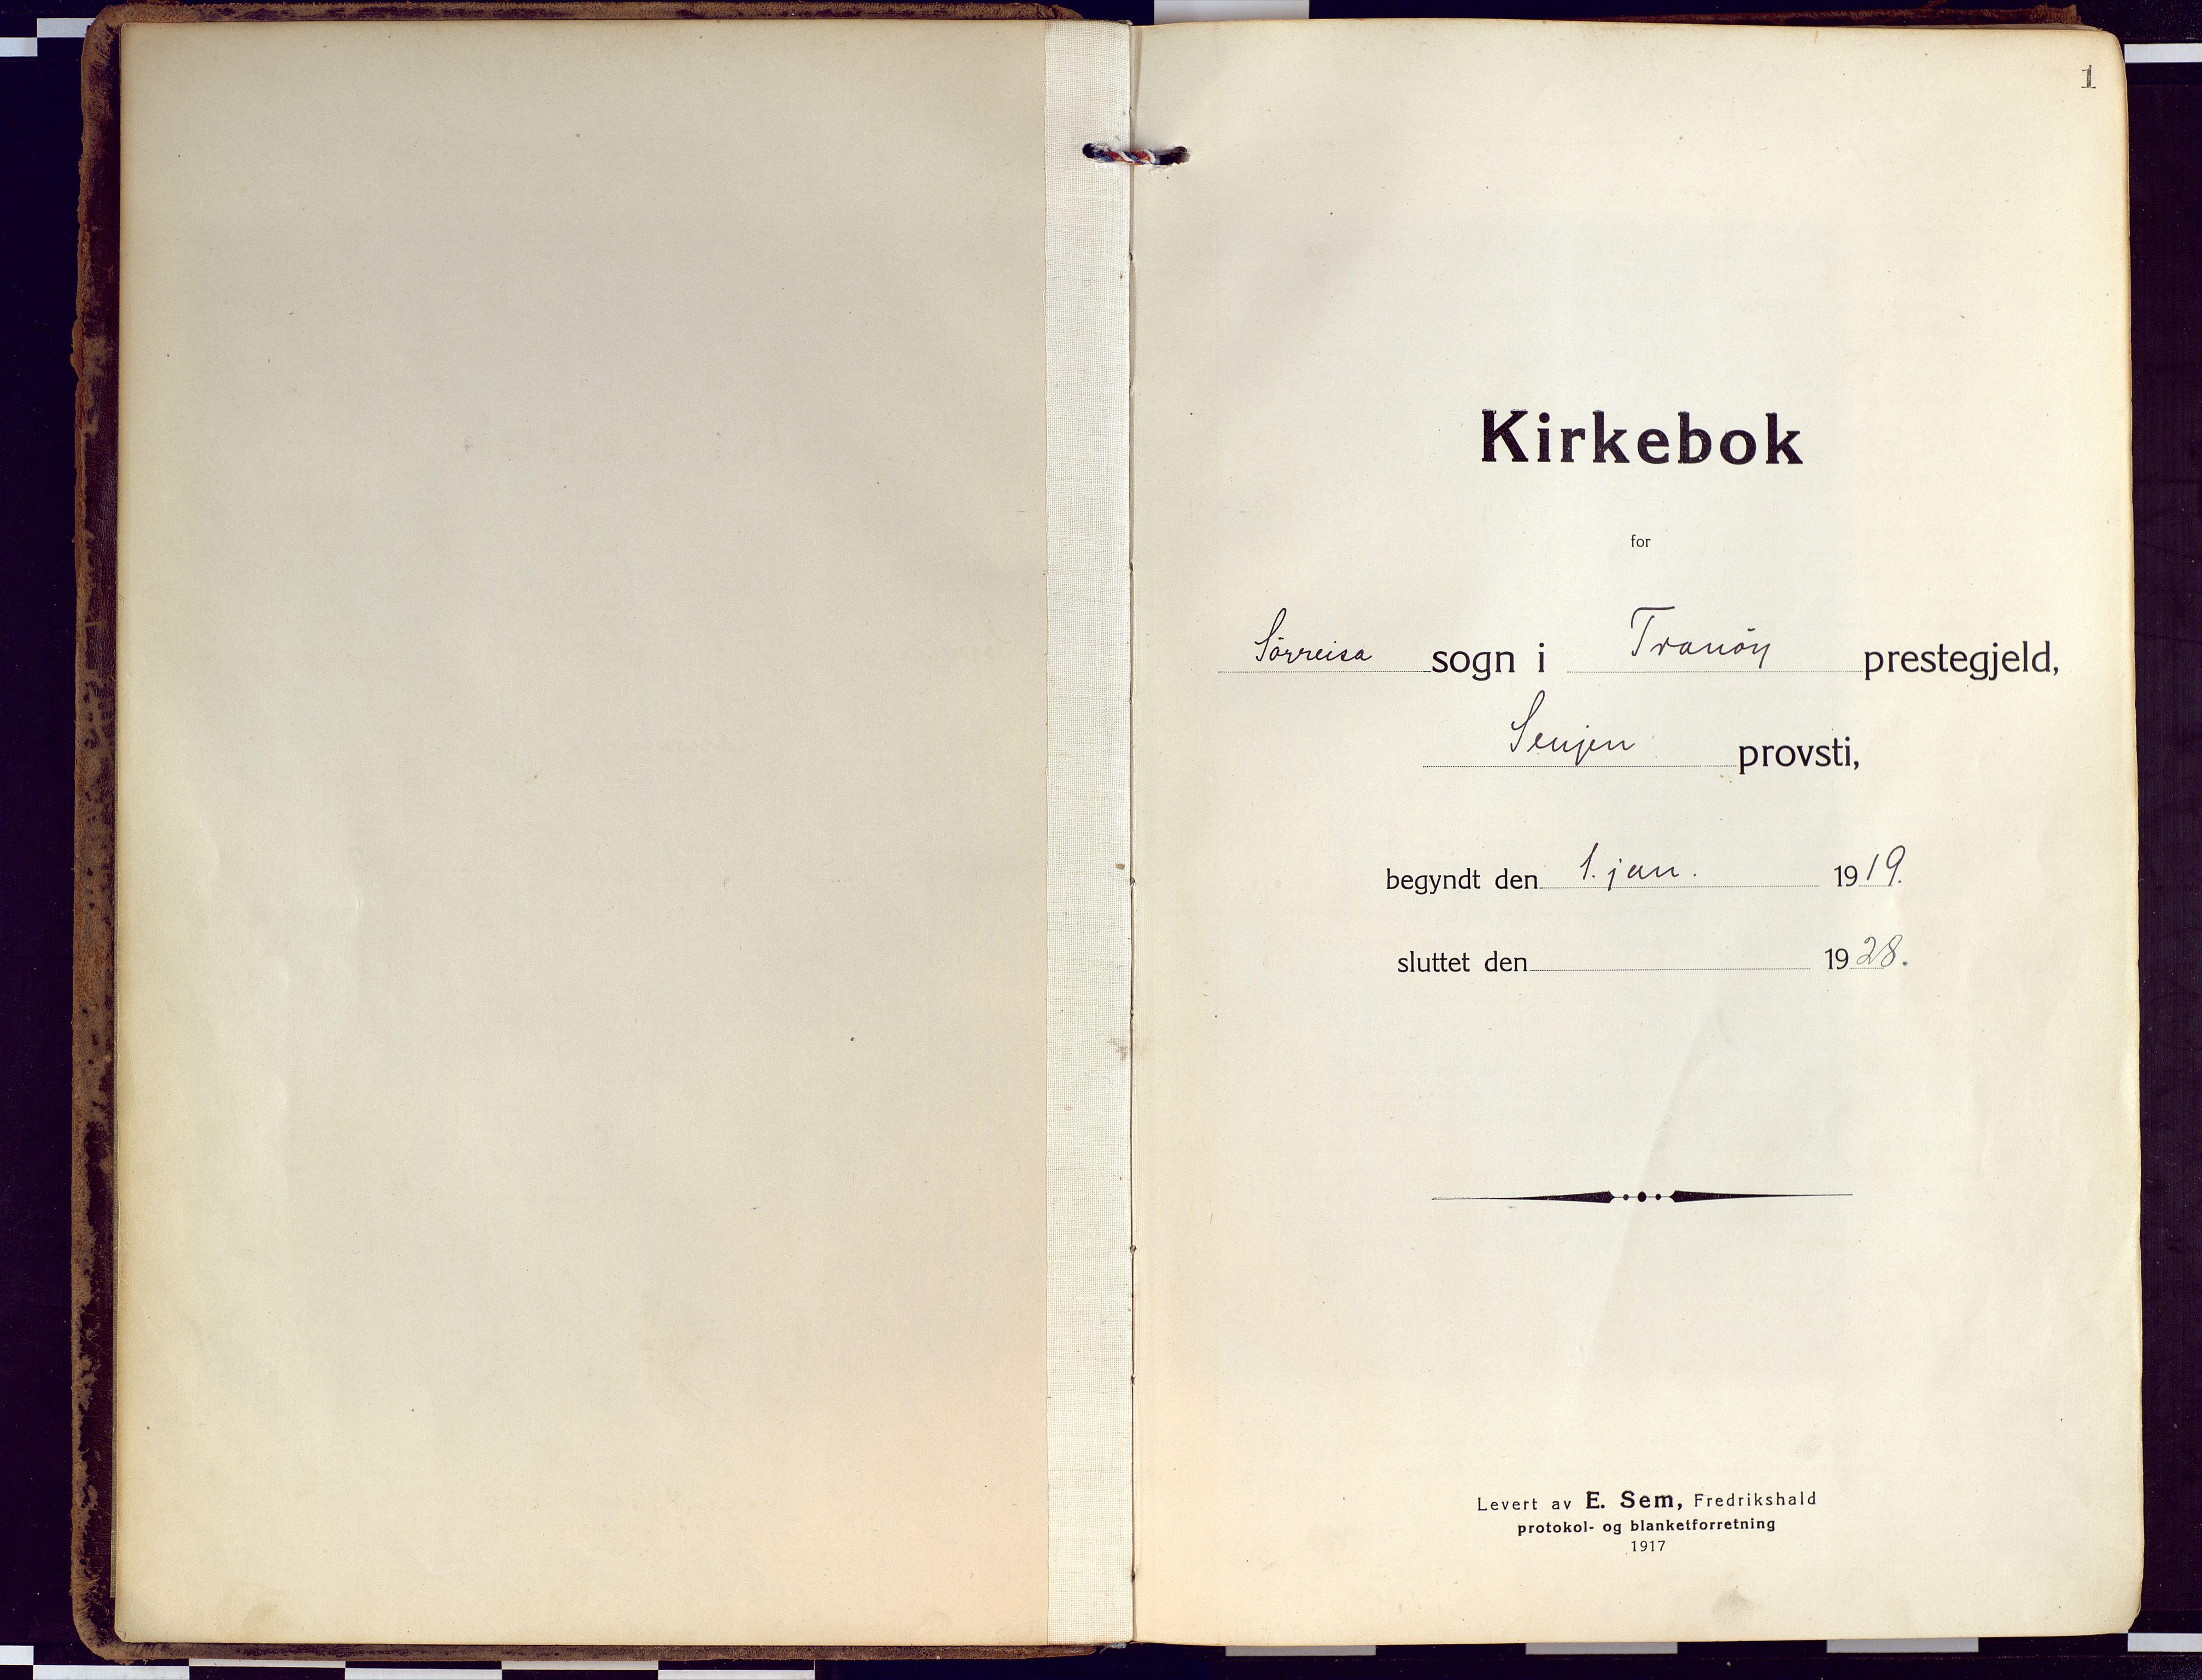 SATØ, Tranøy sokneprestkontor, I/Ia/Iaa/L0015kirke: Ministerialbok nr. 15, 1919-1928, s. 1